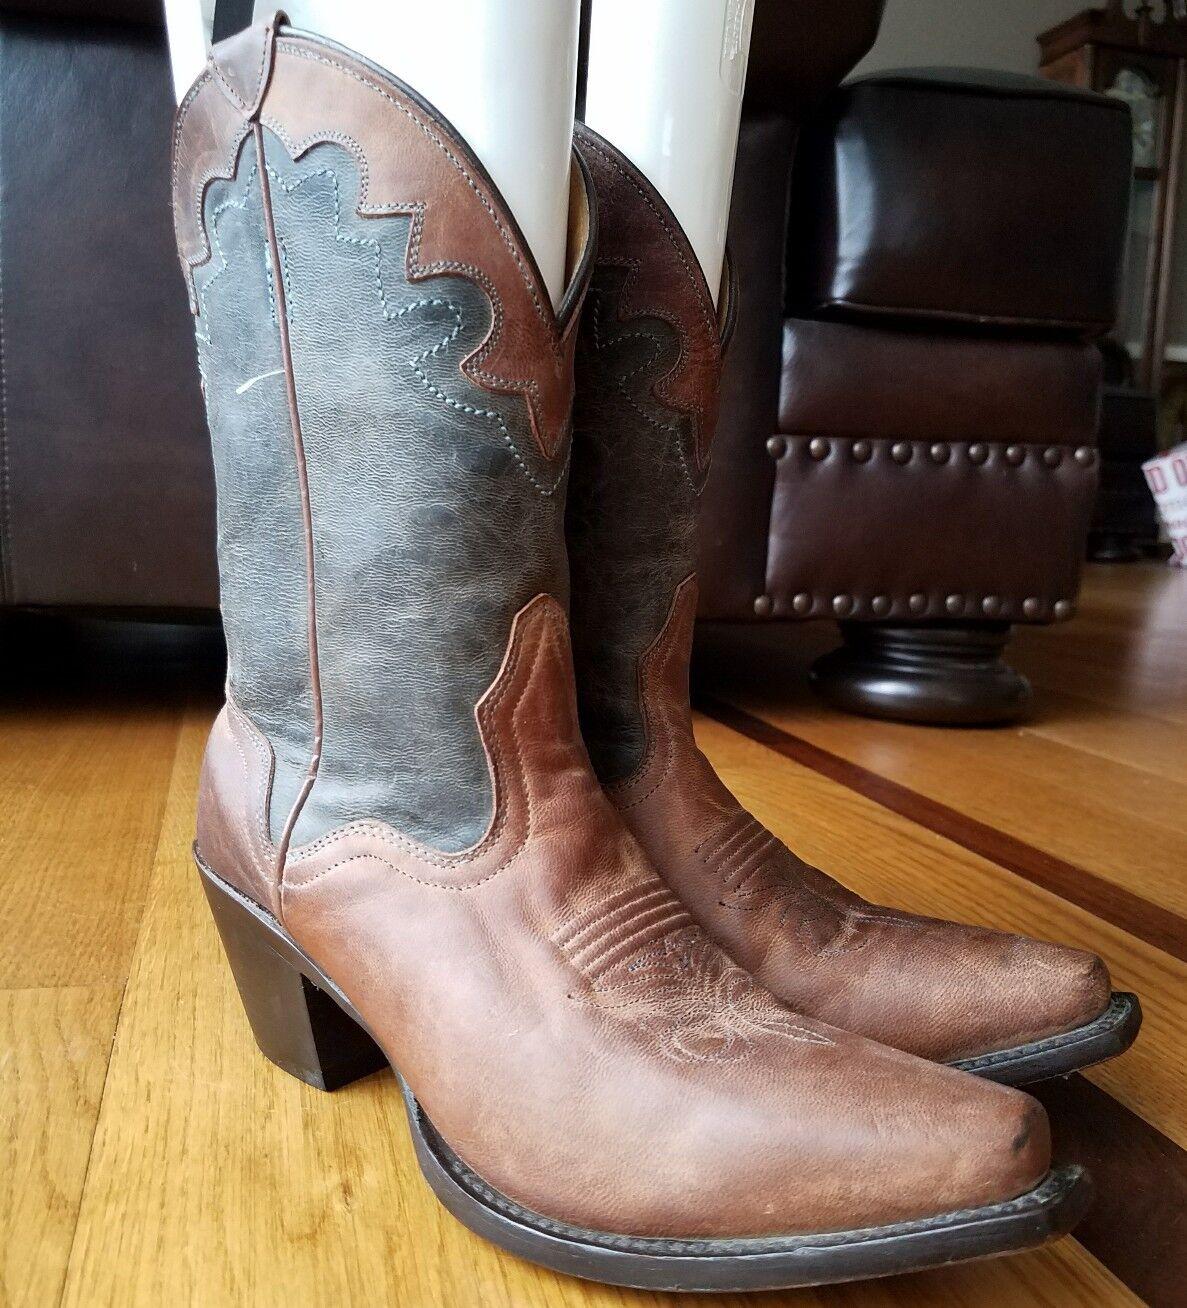 JB DILLON Woman's Cowboy Stiefel Genuine Goat Leder Two Tone Western Größe 6.5 B